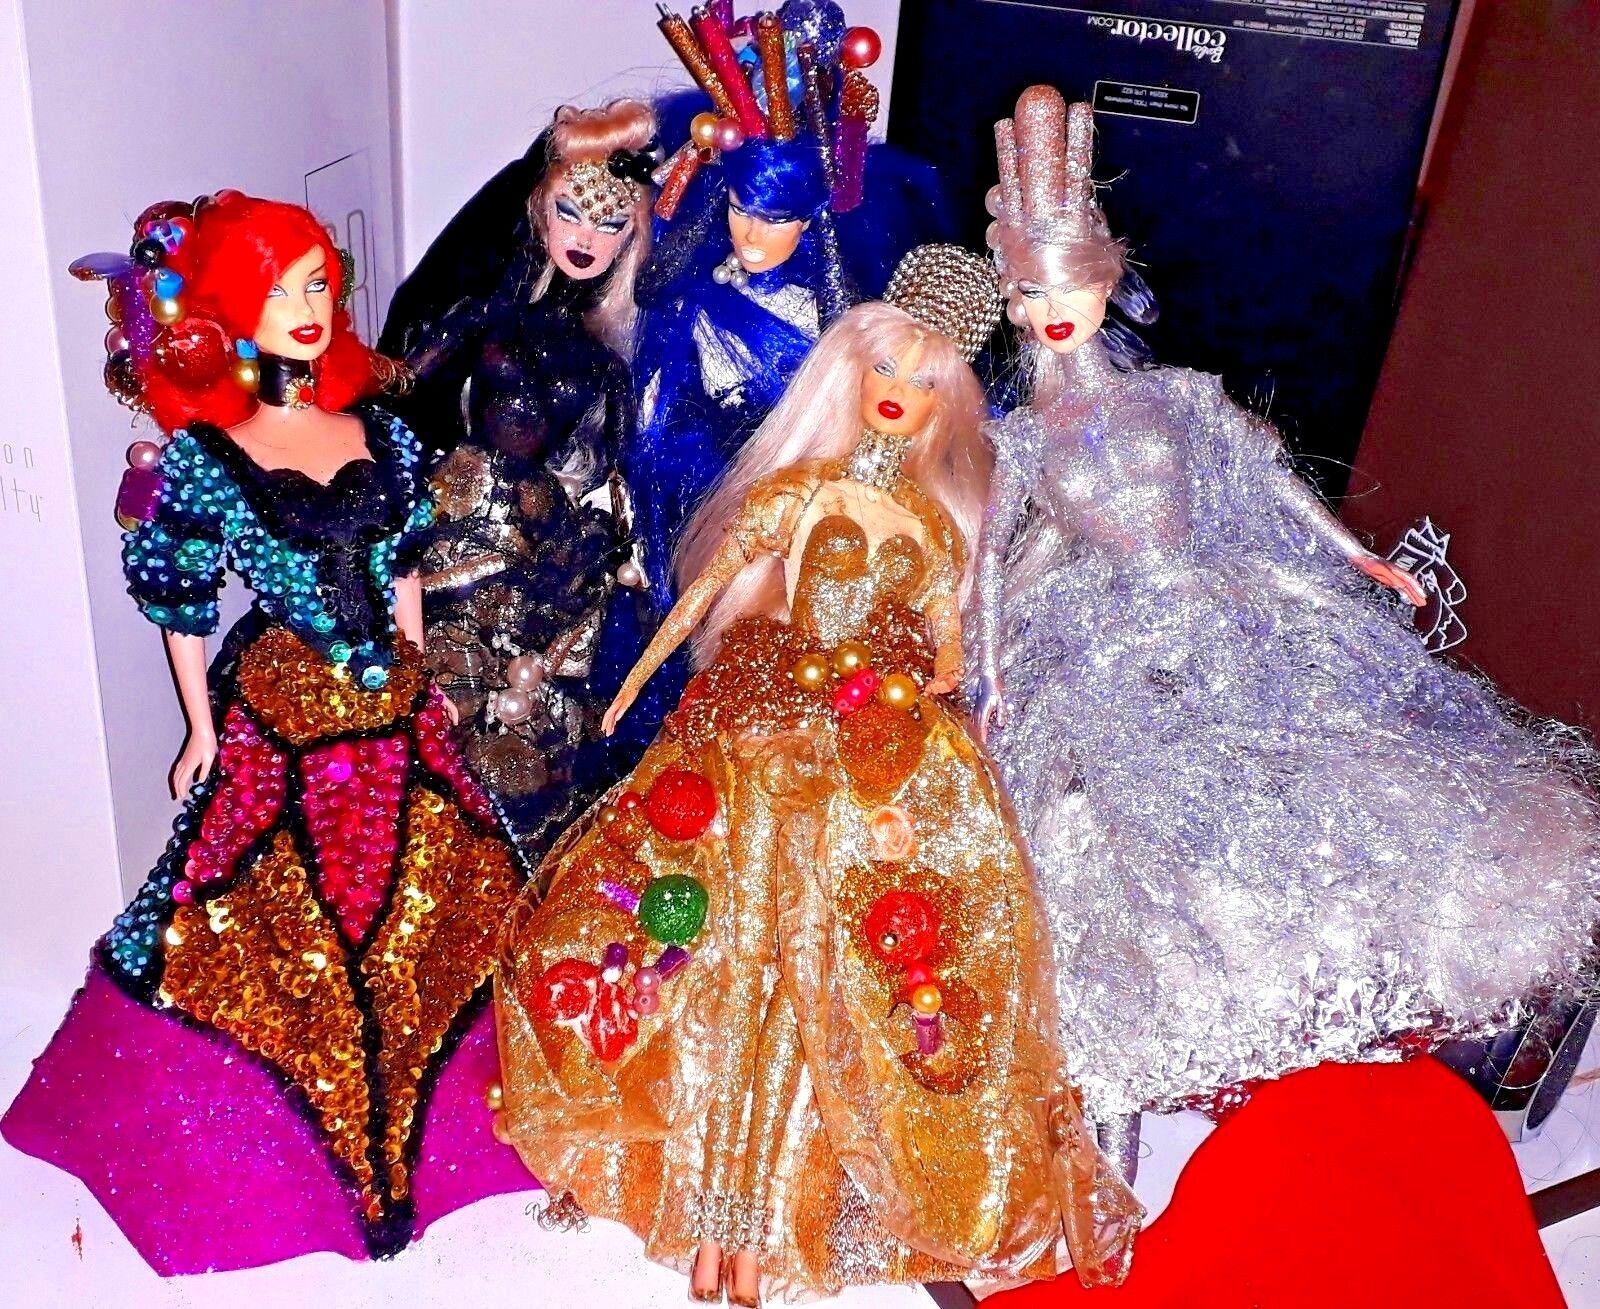 LOTTO ooak CUSTOM FASHION ROYALTY BARBIE MUSE CUSTOM ooak OOAK Gothic Fashion royaltyART DOL 376a1d